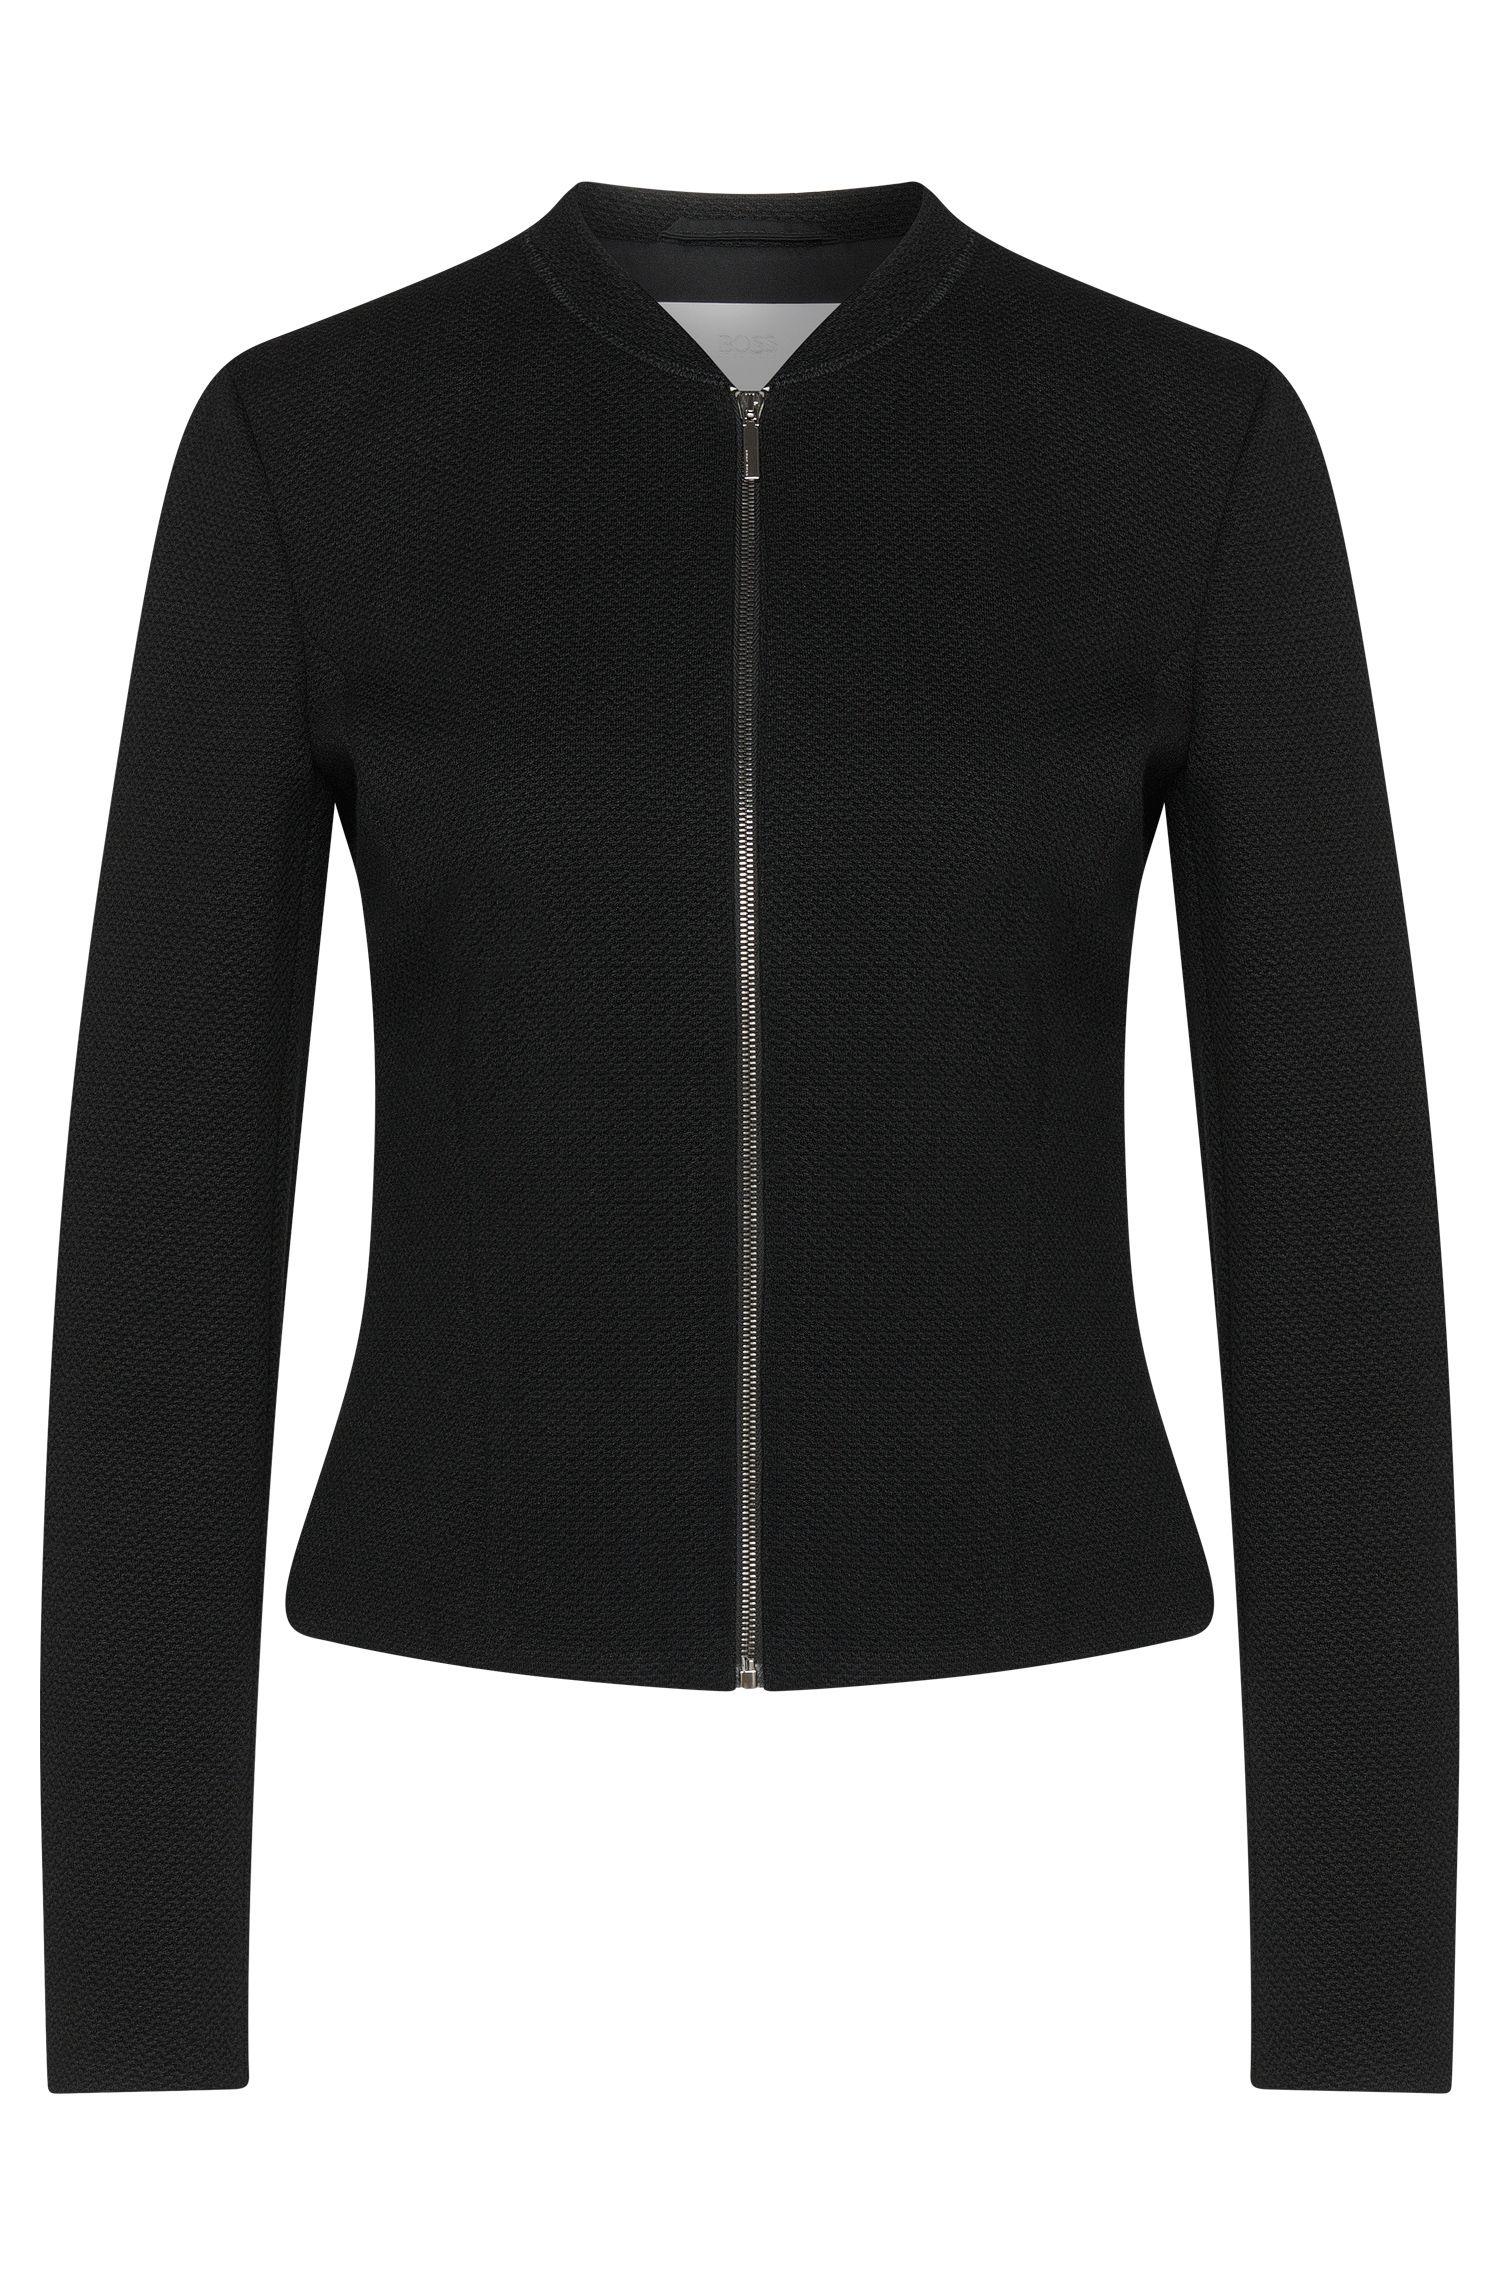 'Kelala' | Textured Jersey Fitted Blazer